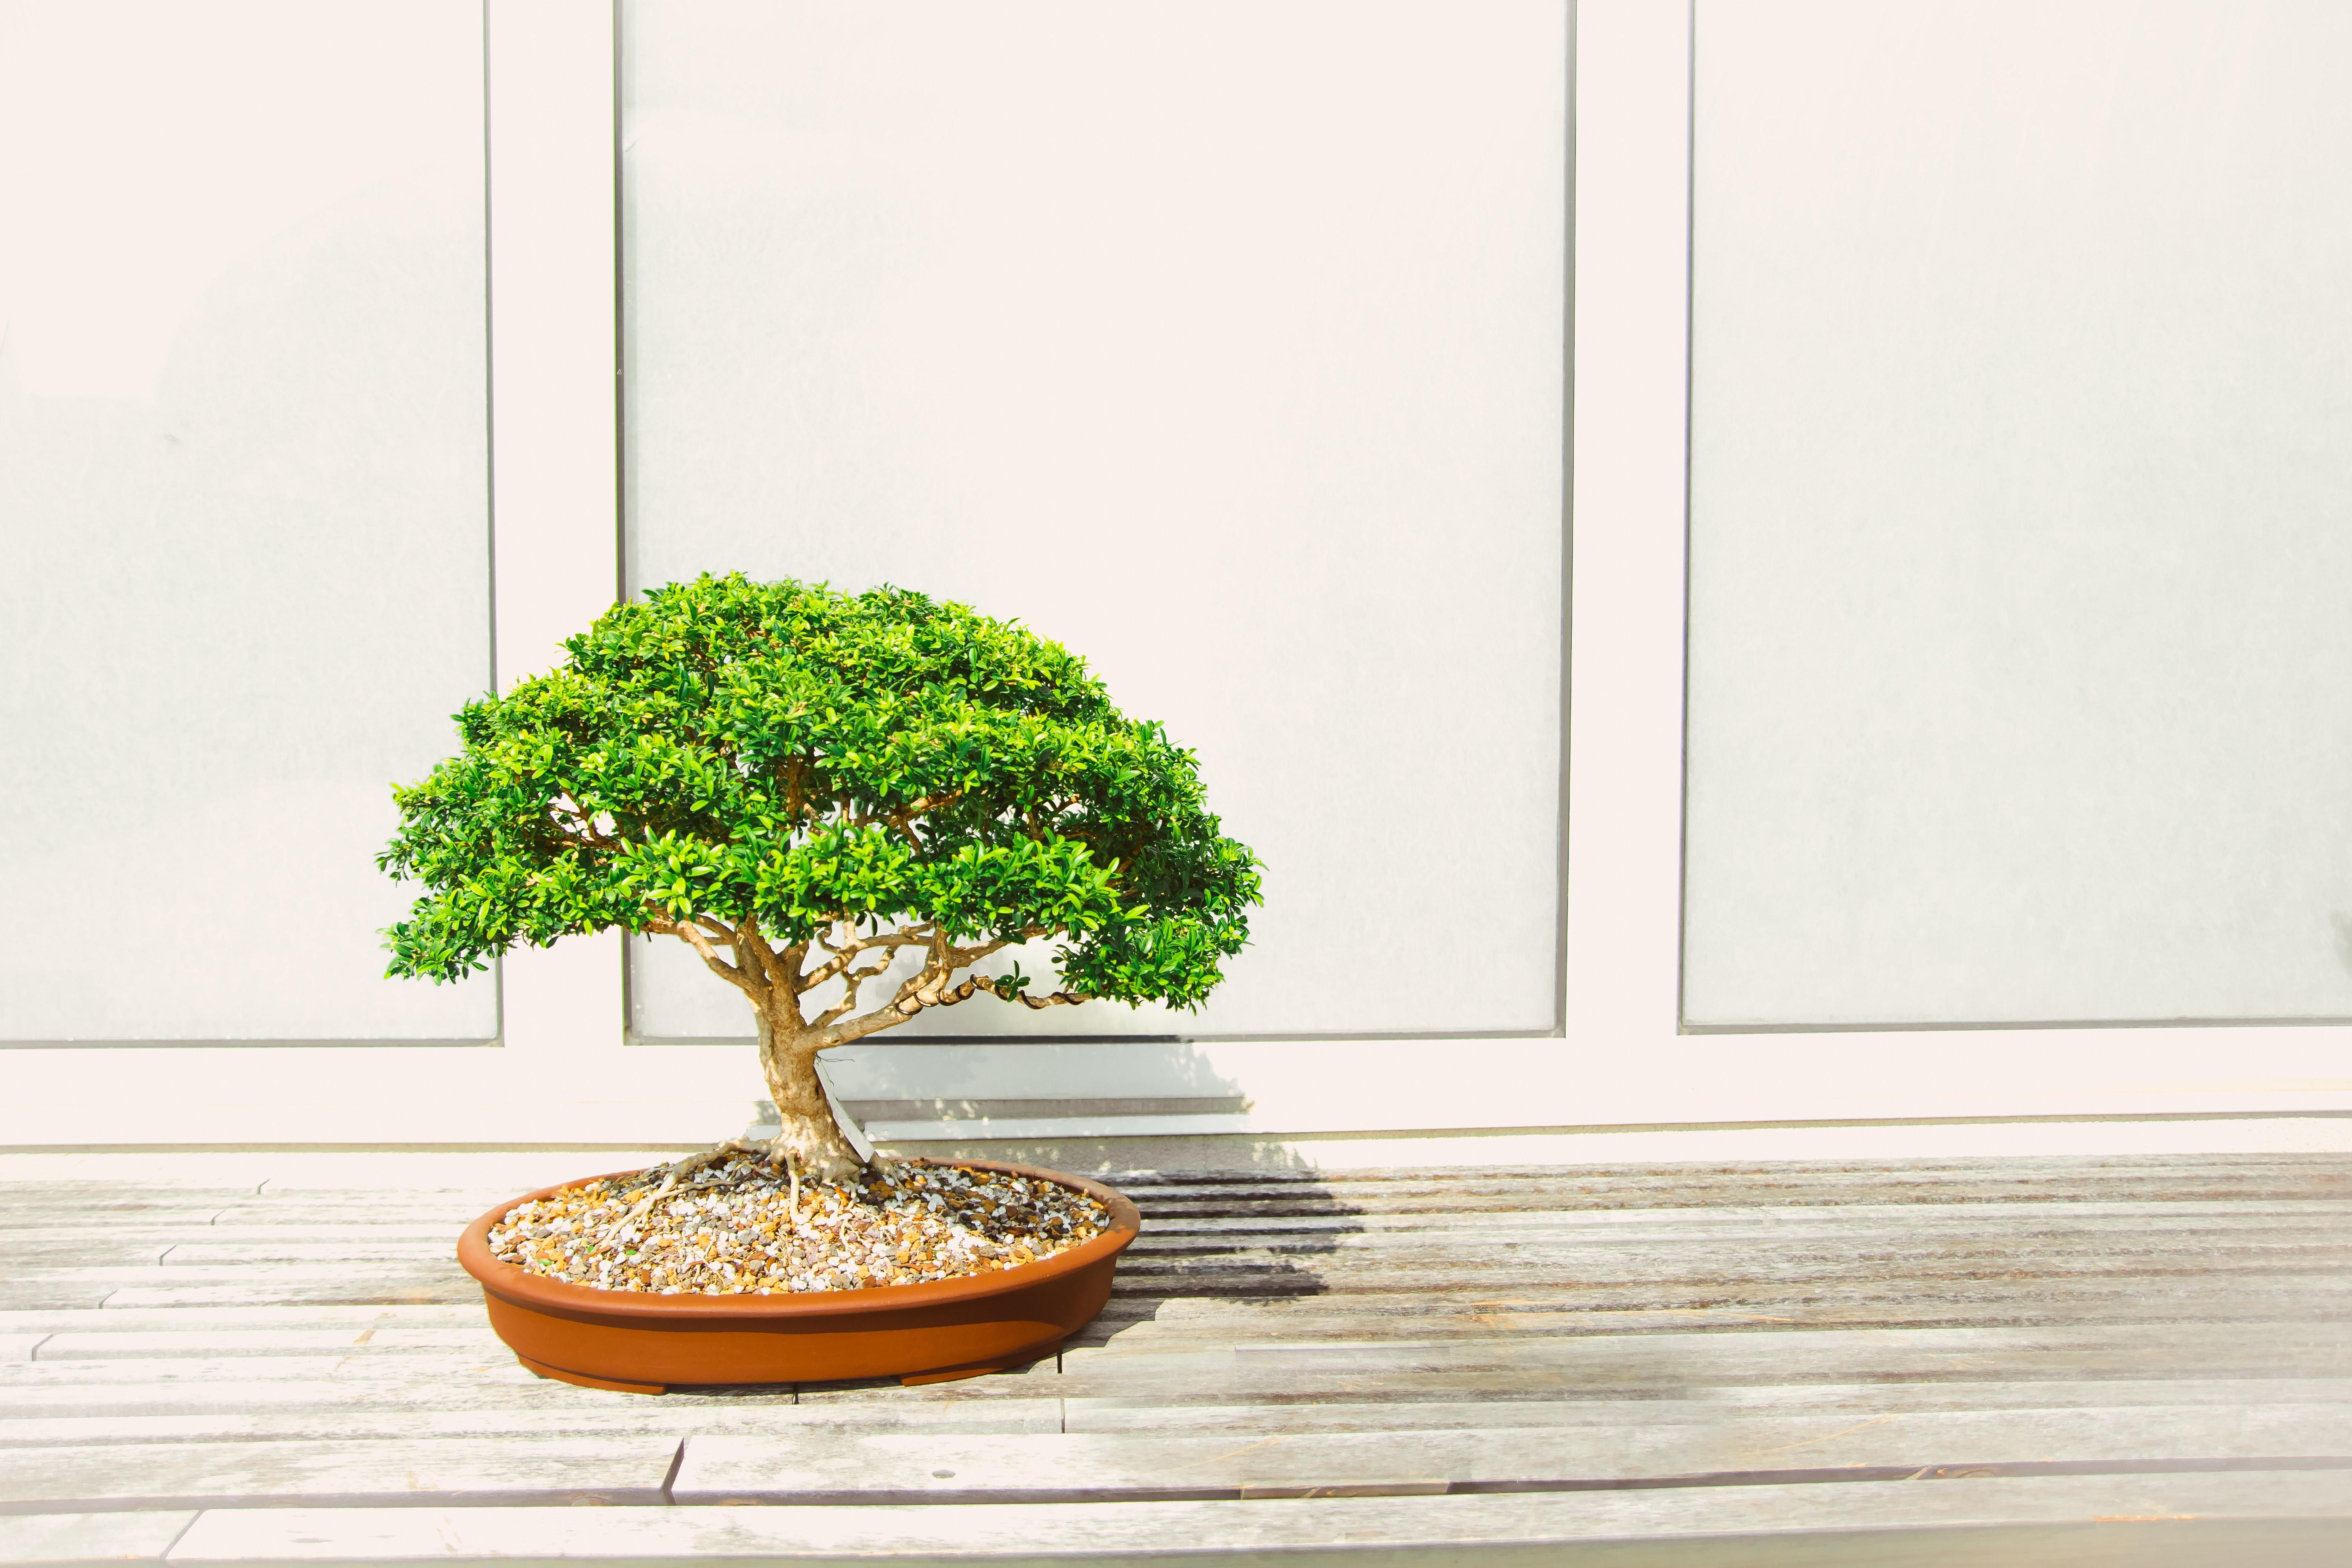 Free Images Houseplant Bonsai Flowerpot Tree Green Woody Plant Flower Sageretia Theezans 5809x3873 1532341 Free Stock Photos Pxhere